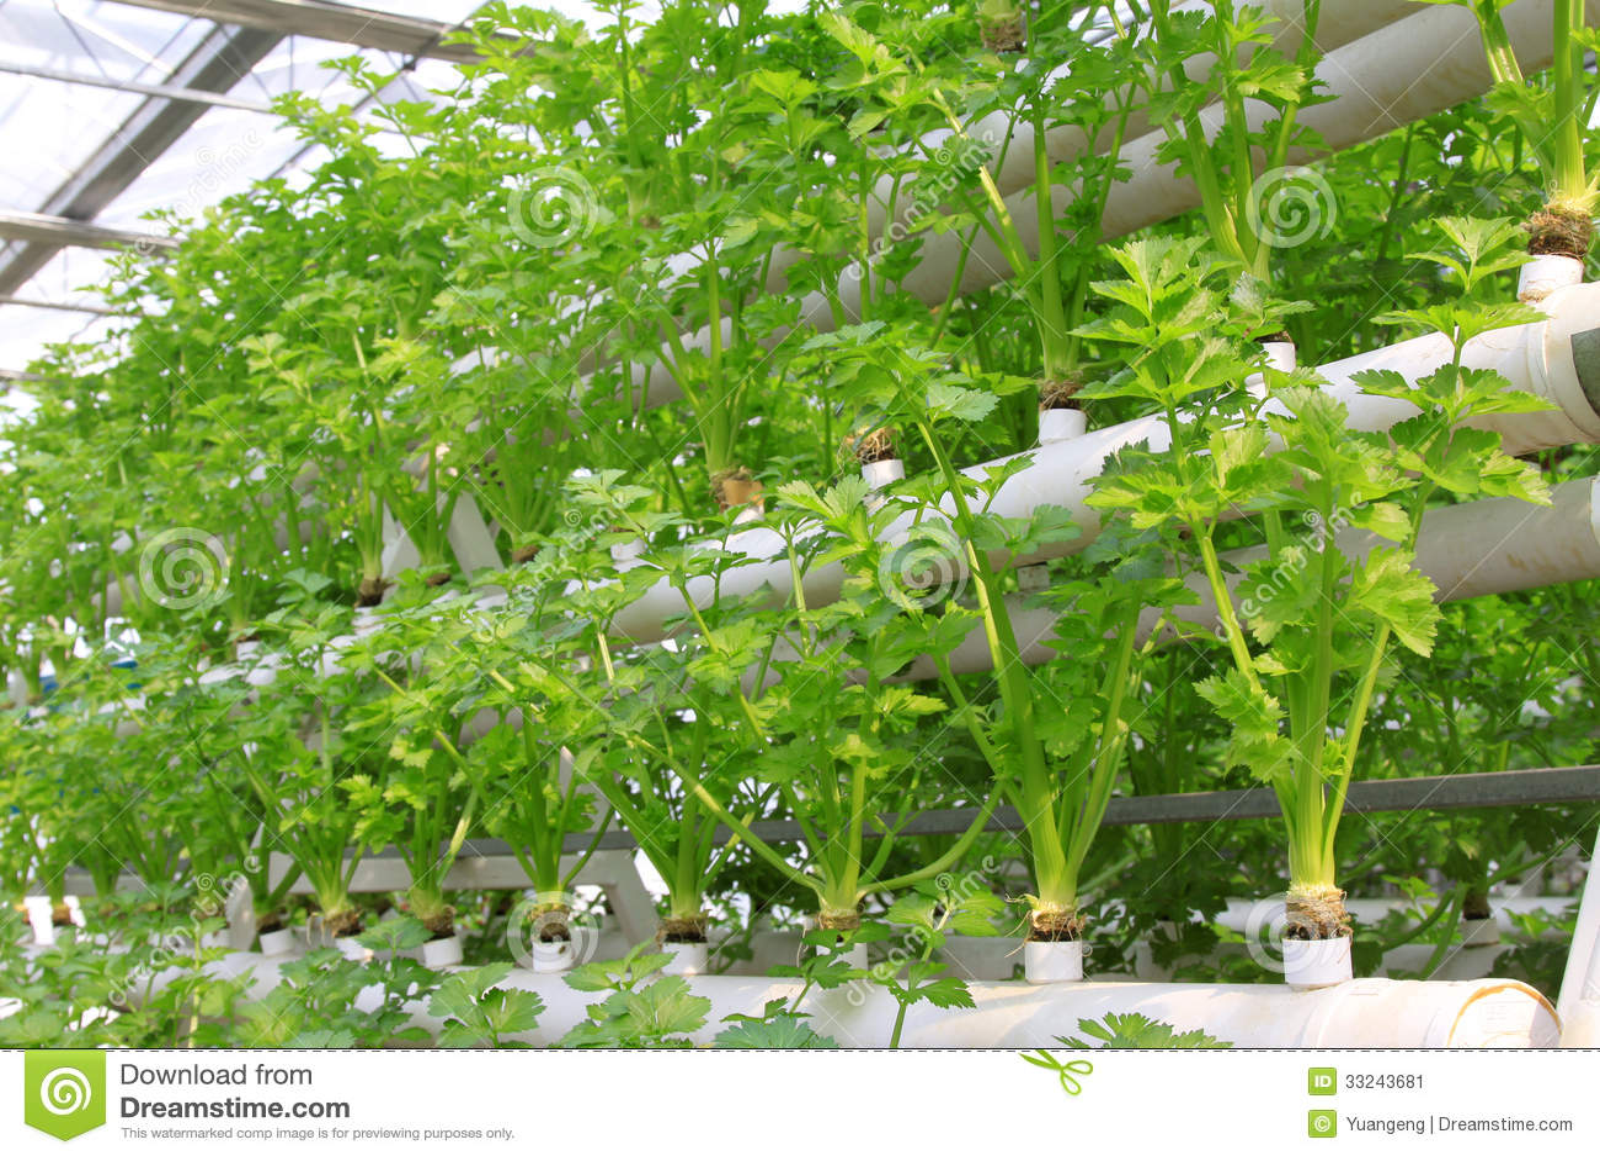 Soilless cultivation of green vegetables stock image for Soil less farming